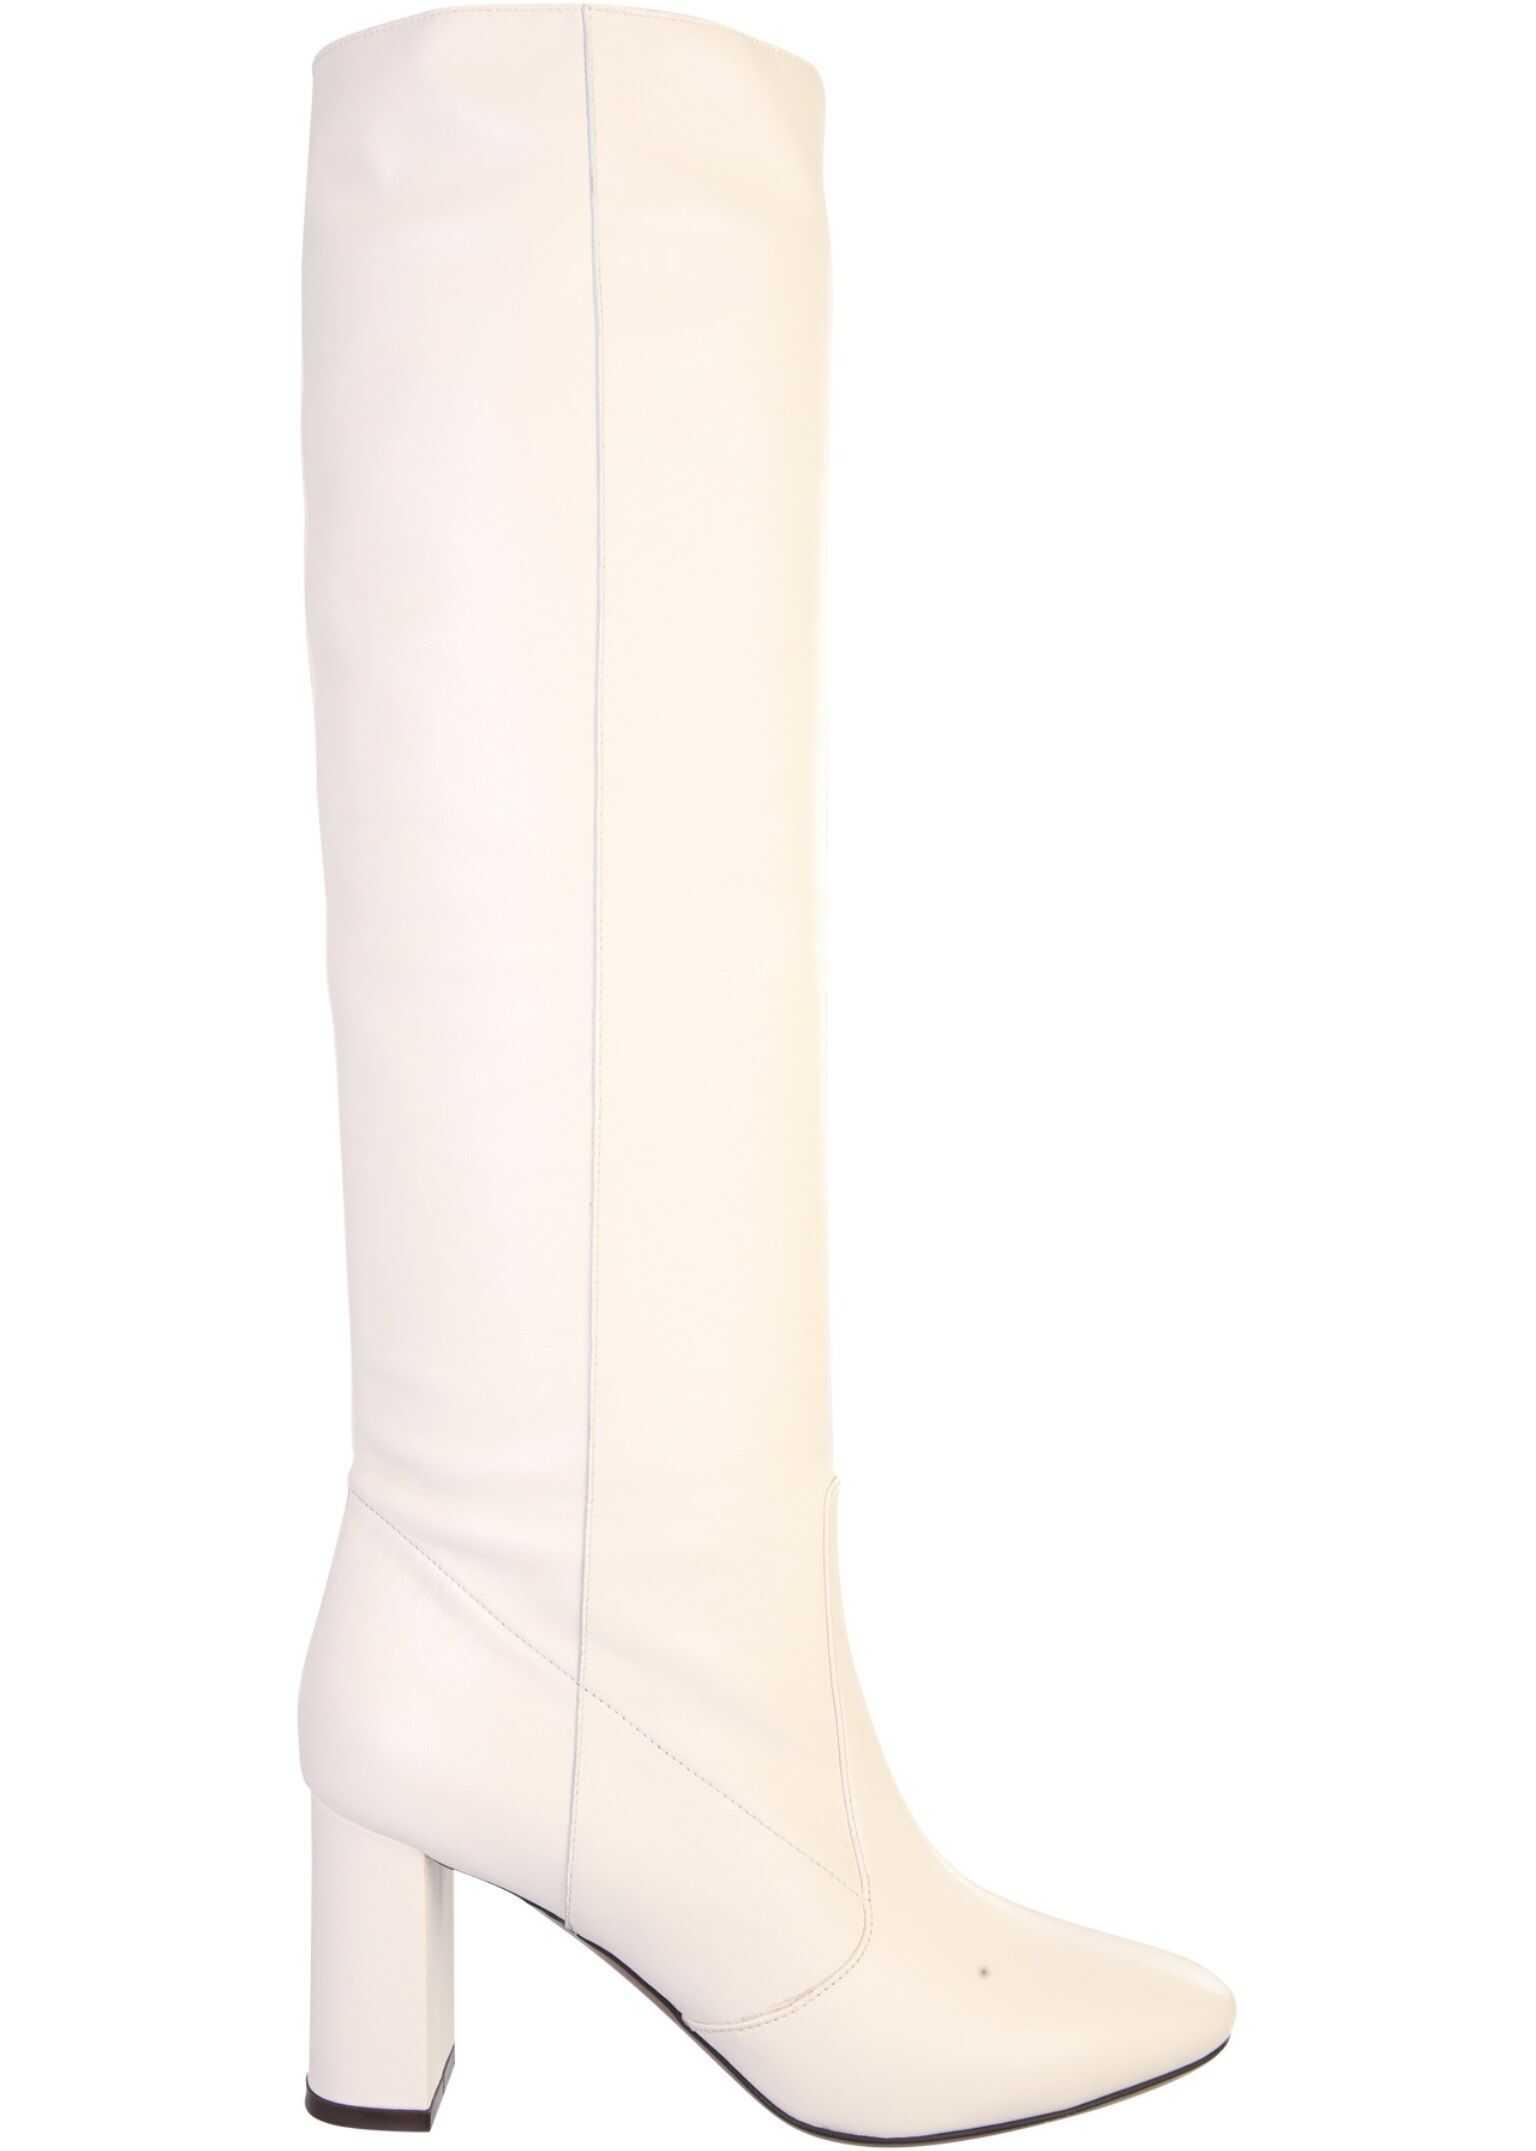 L'Autre Chose Tubular Boots LDL078_26153020 WHITE imagine b-mall.ro